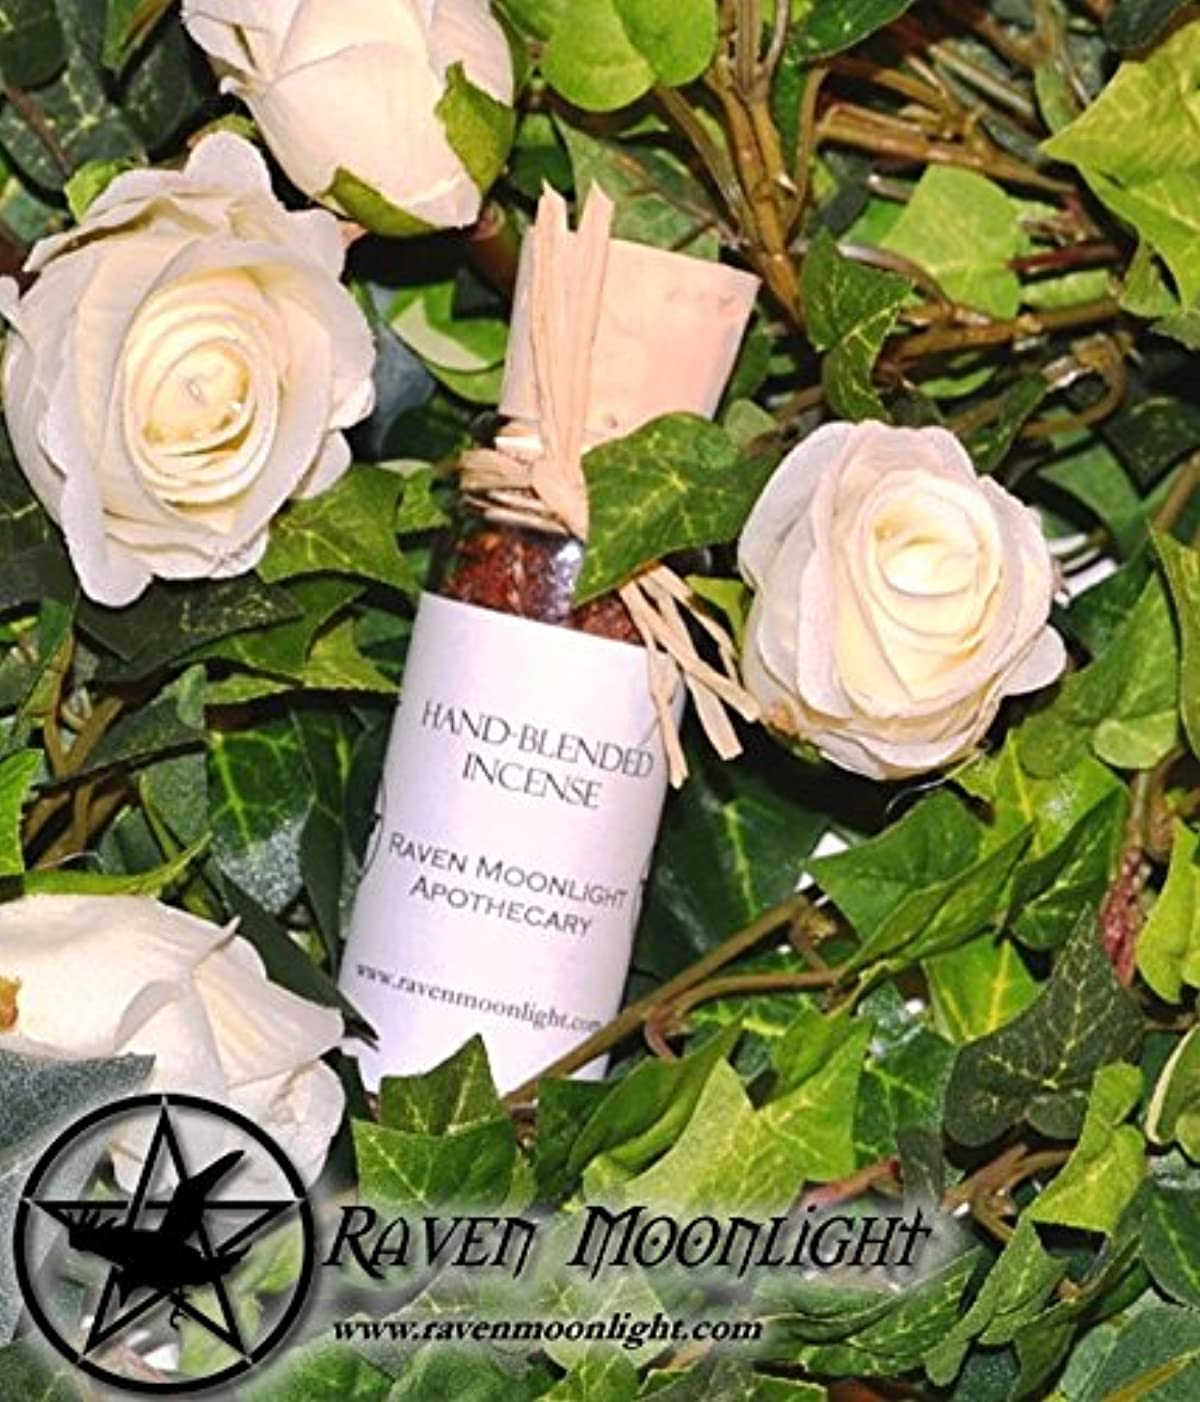 hand-blended Incense : Arawn